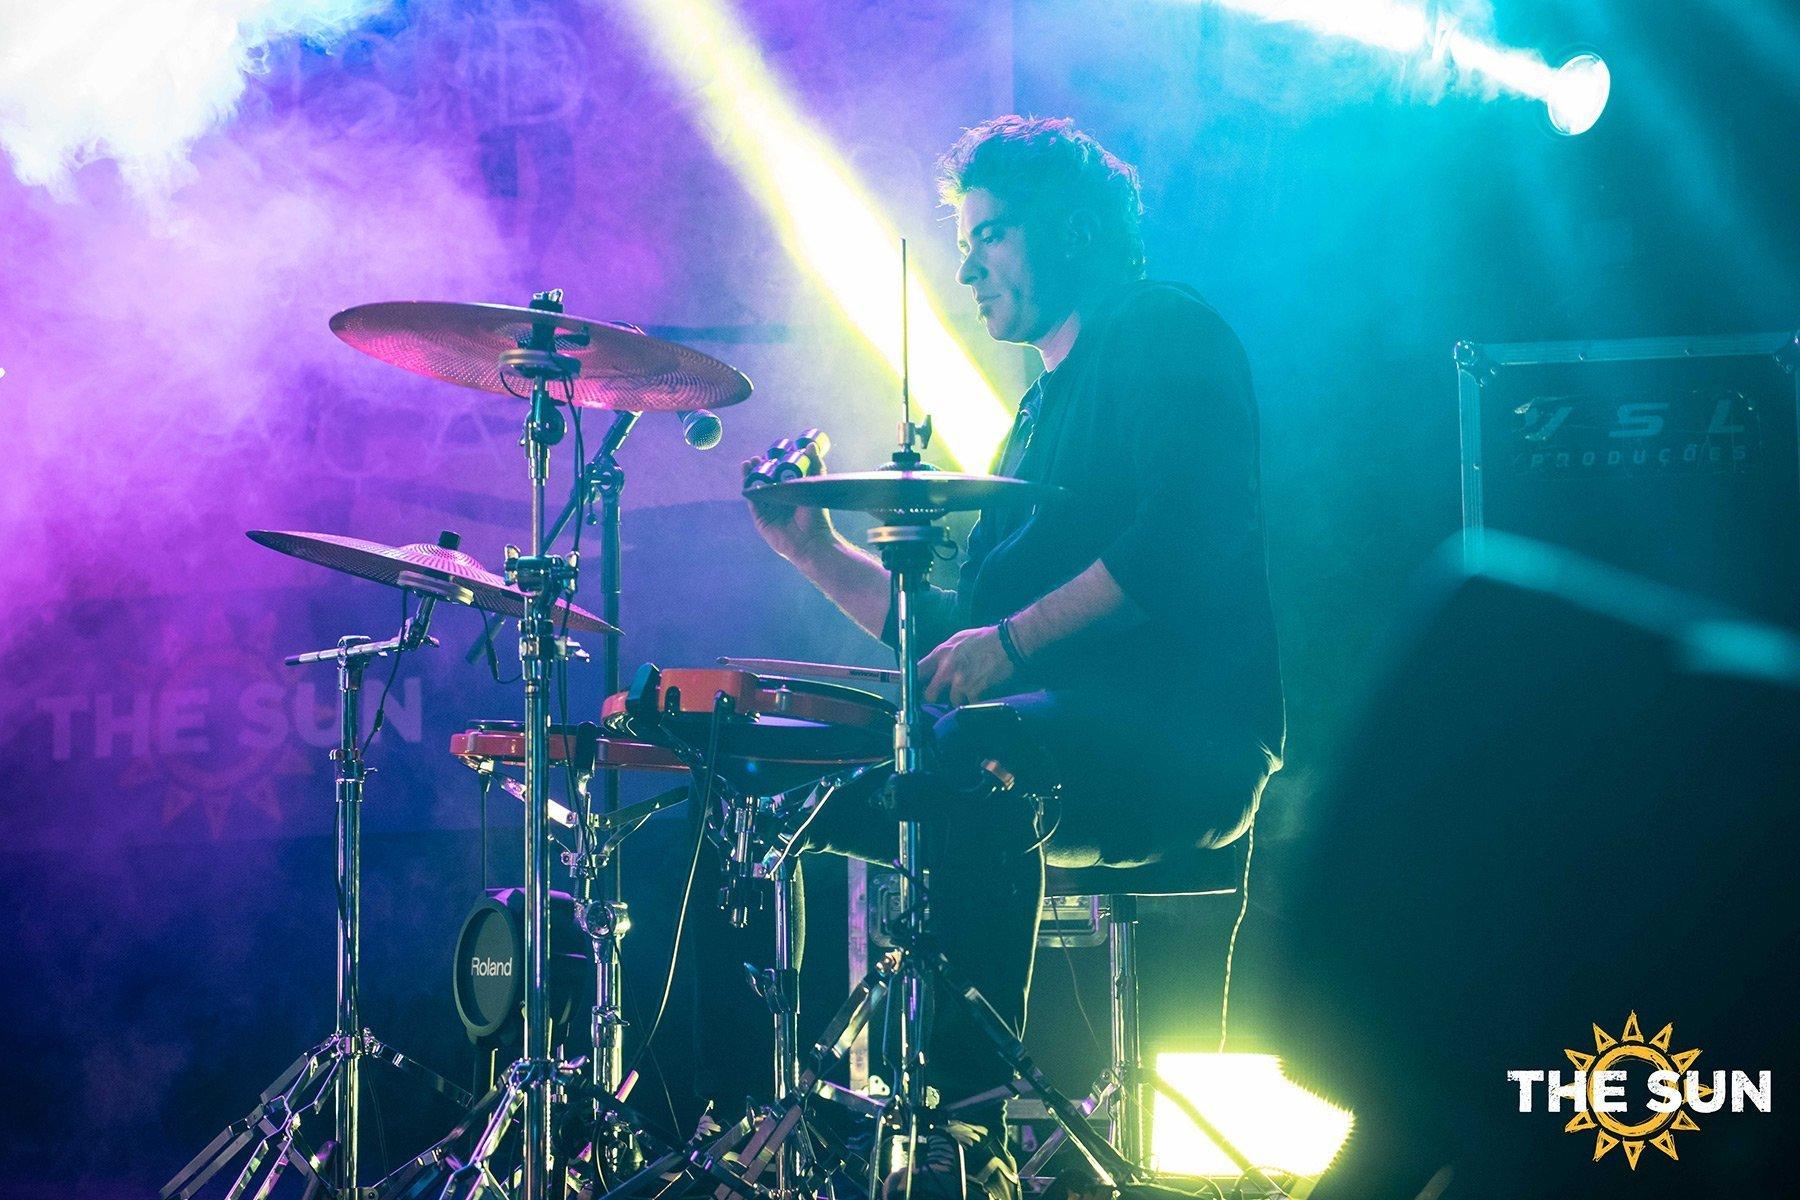 the sun rock band live riccardo rossi